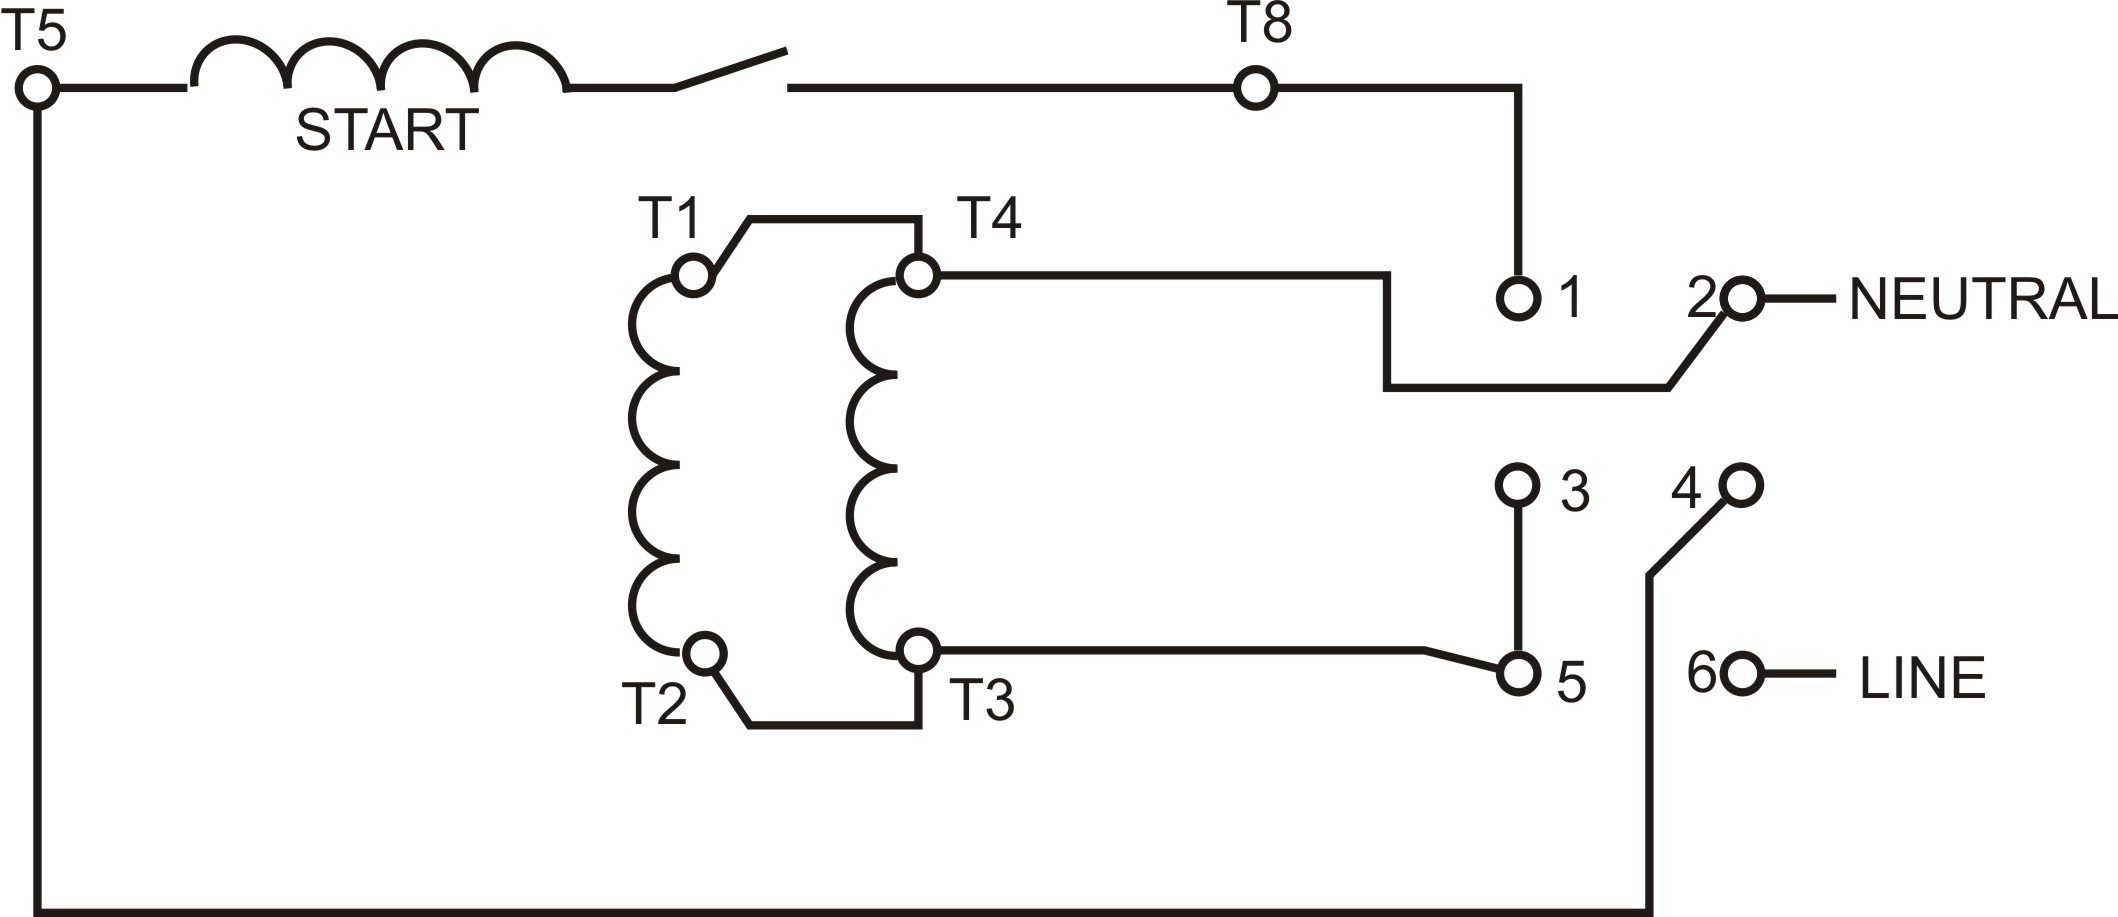 Reversing Single Phase Motor Wiring Diagram Unique Wiring Diagram Od Rv Park – Amalgamagency